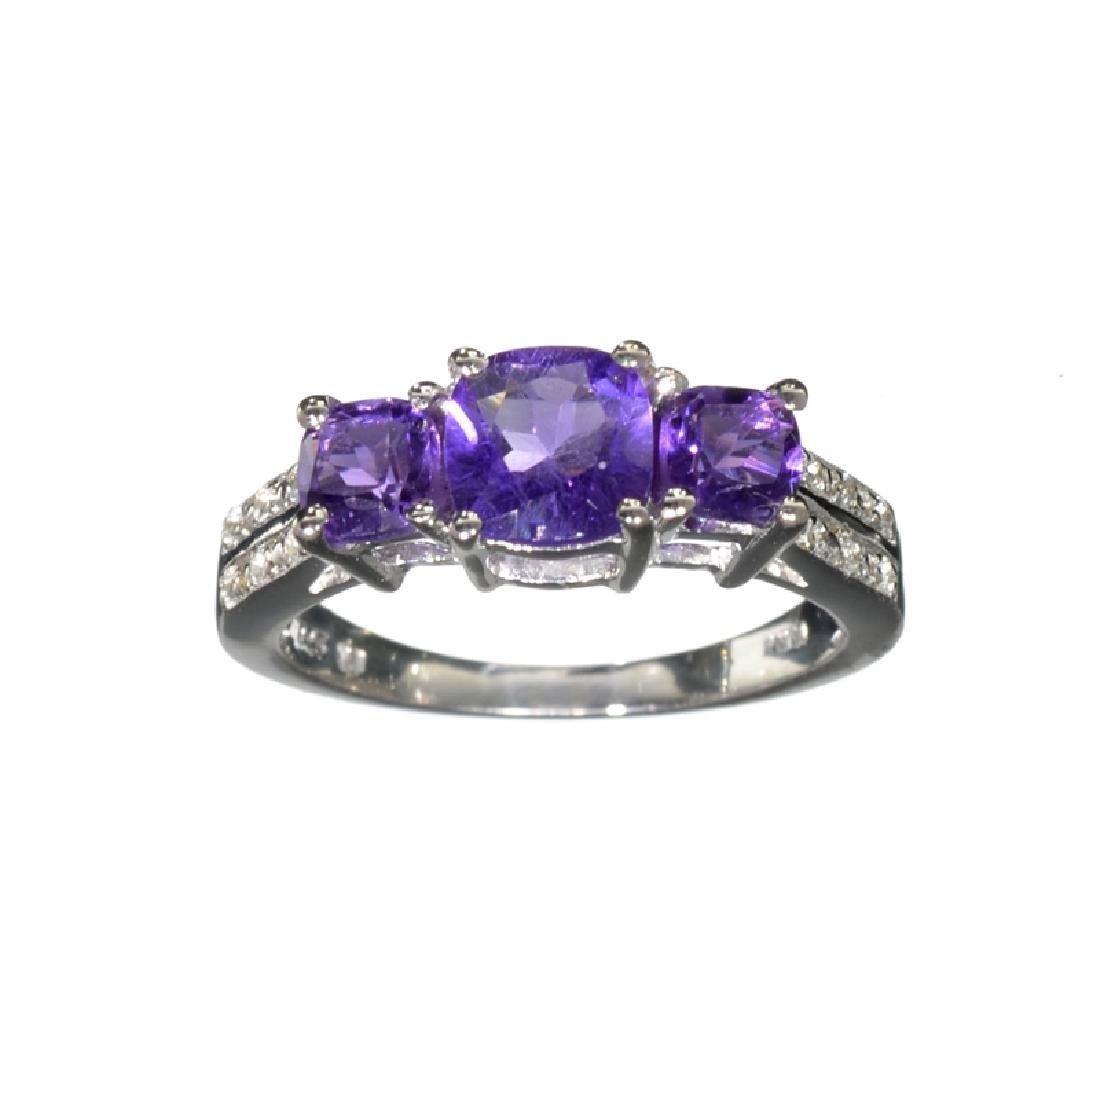 APP: 0.5k Fine Jewelry 1.54CT Purple Amethyst And White